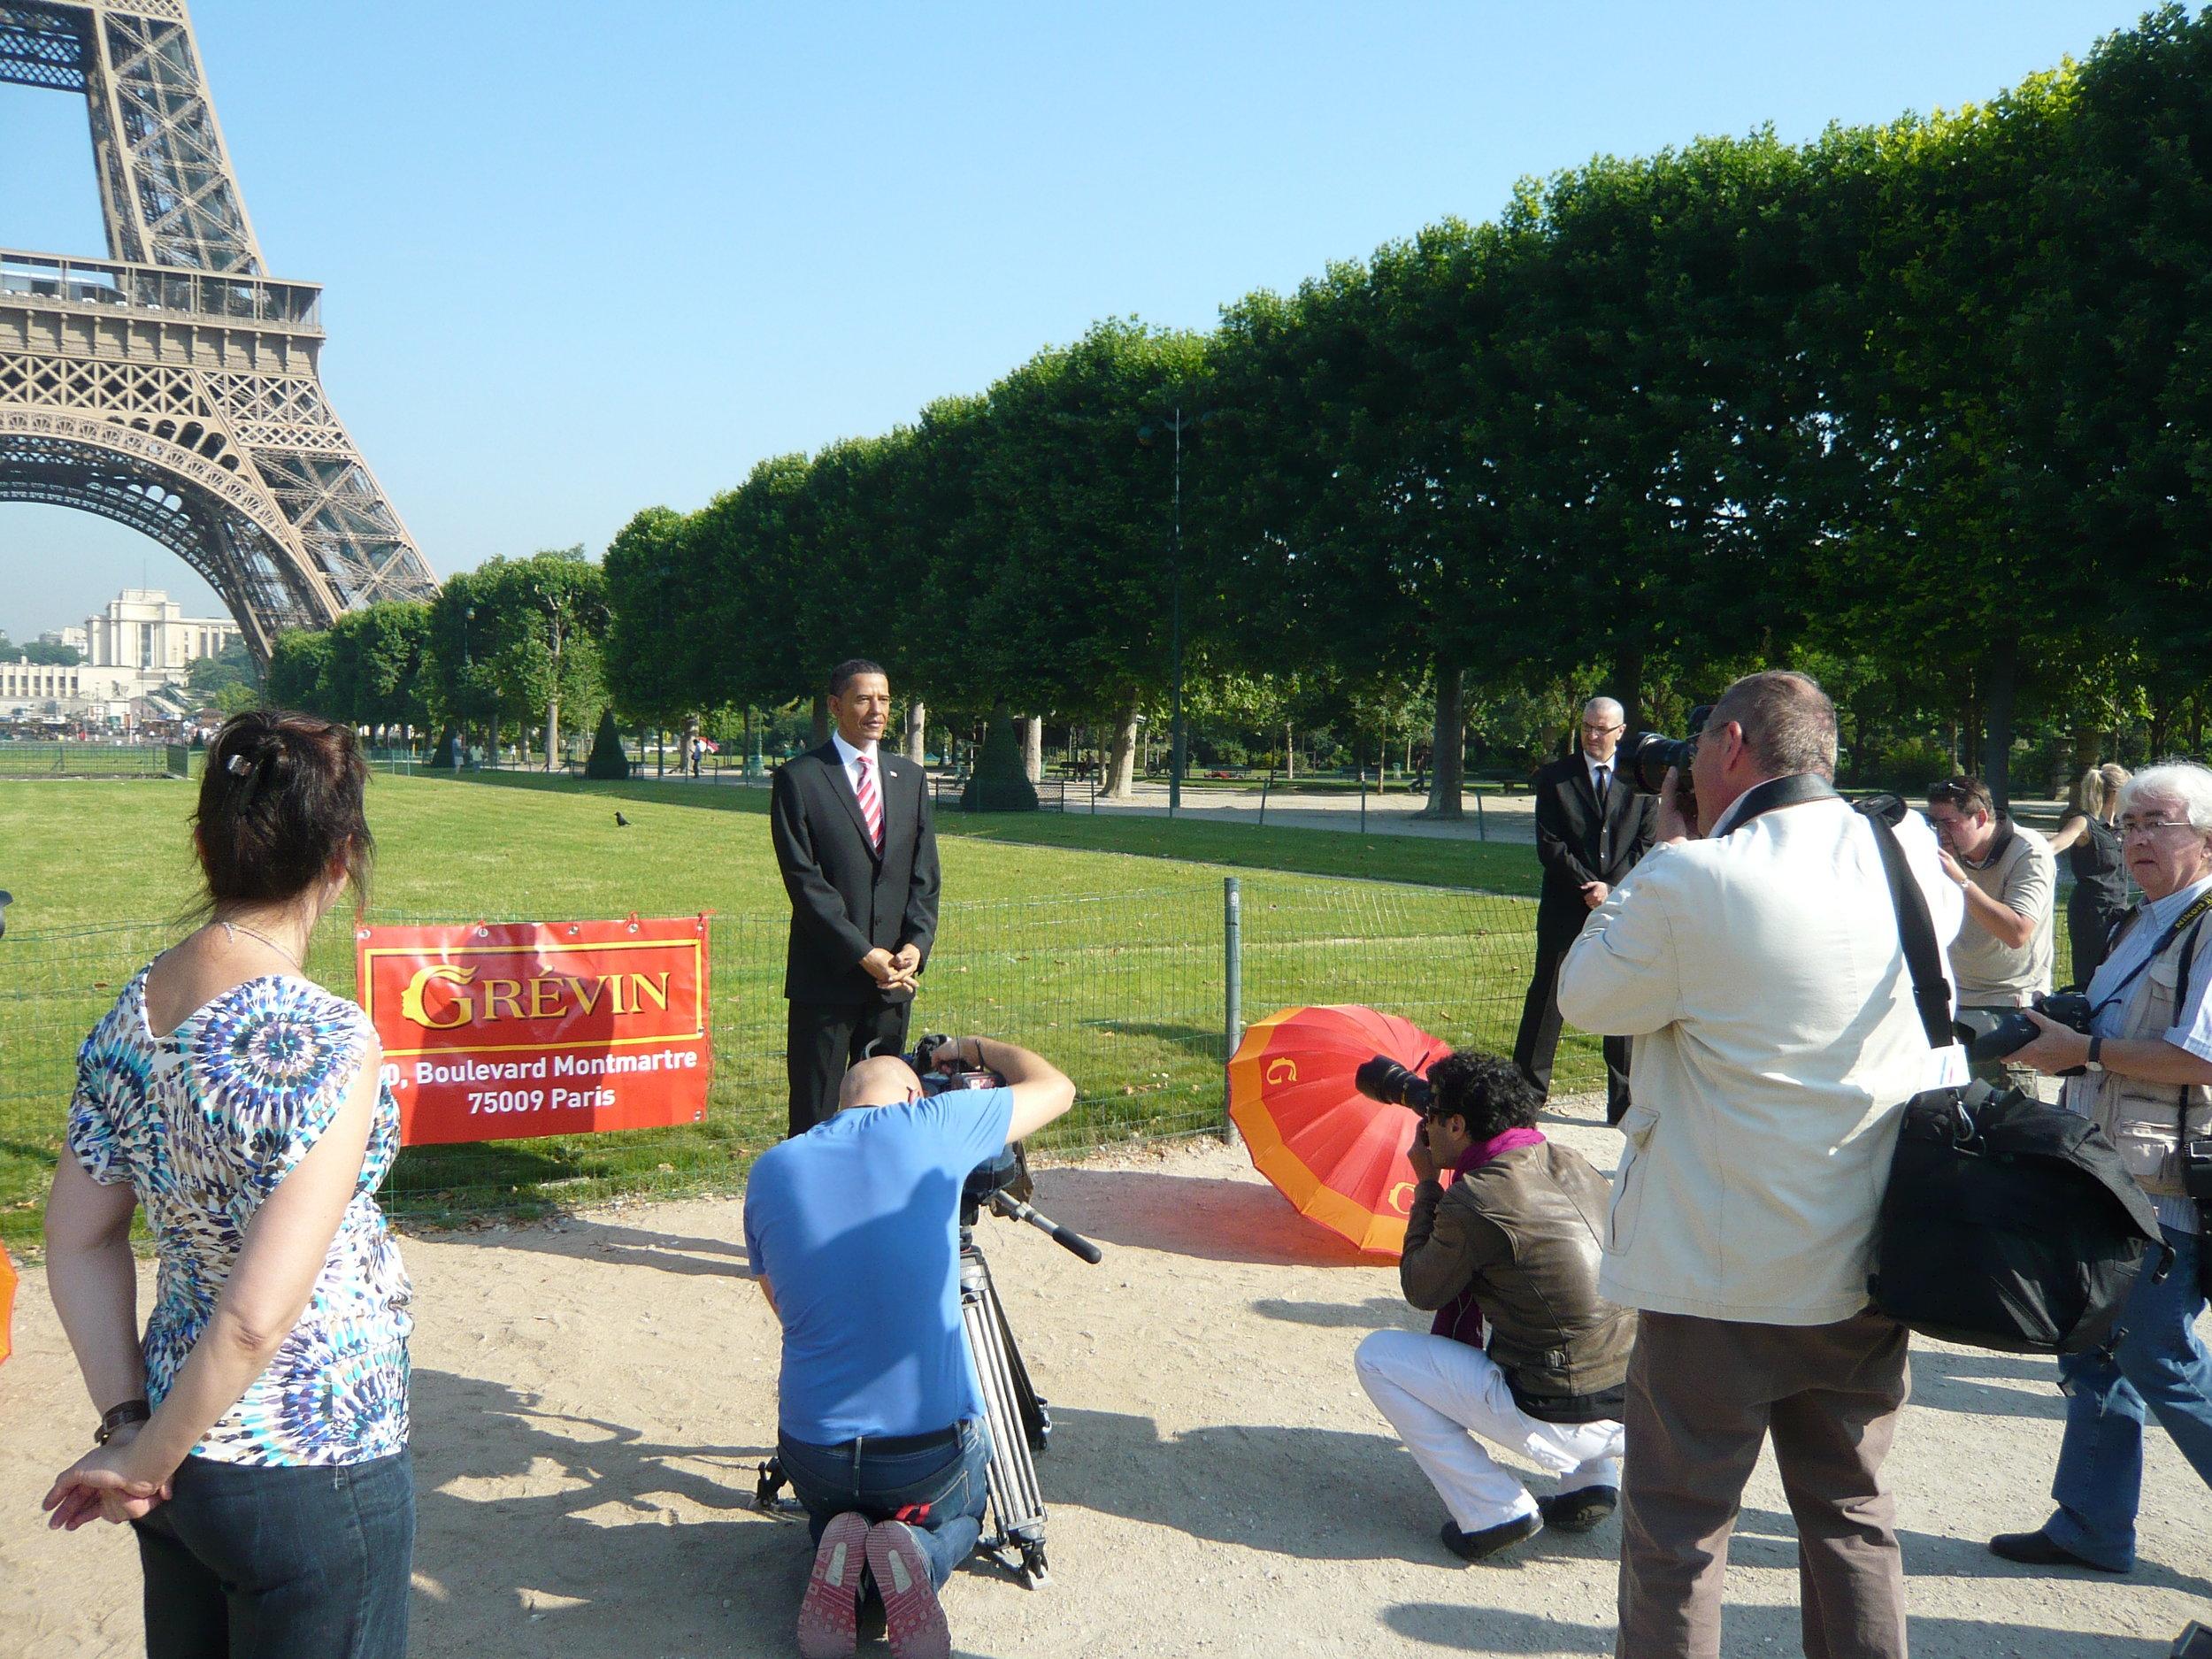 Barack Obama - Wax sculpture - Modelling by Eric Saint Chaffray - Credit Musée Grévin